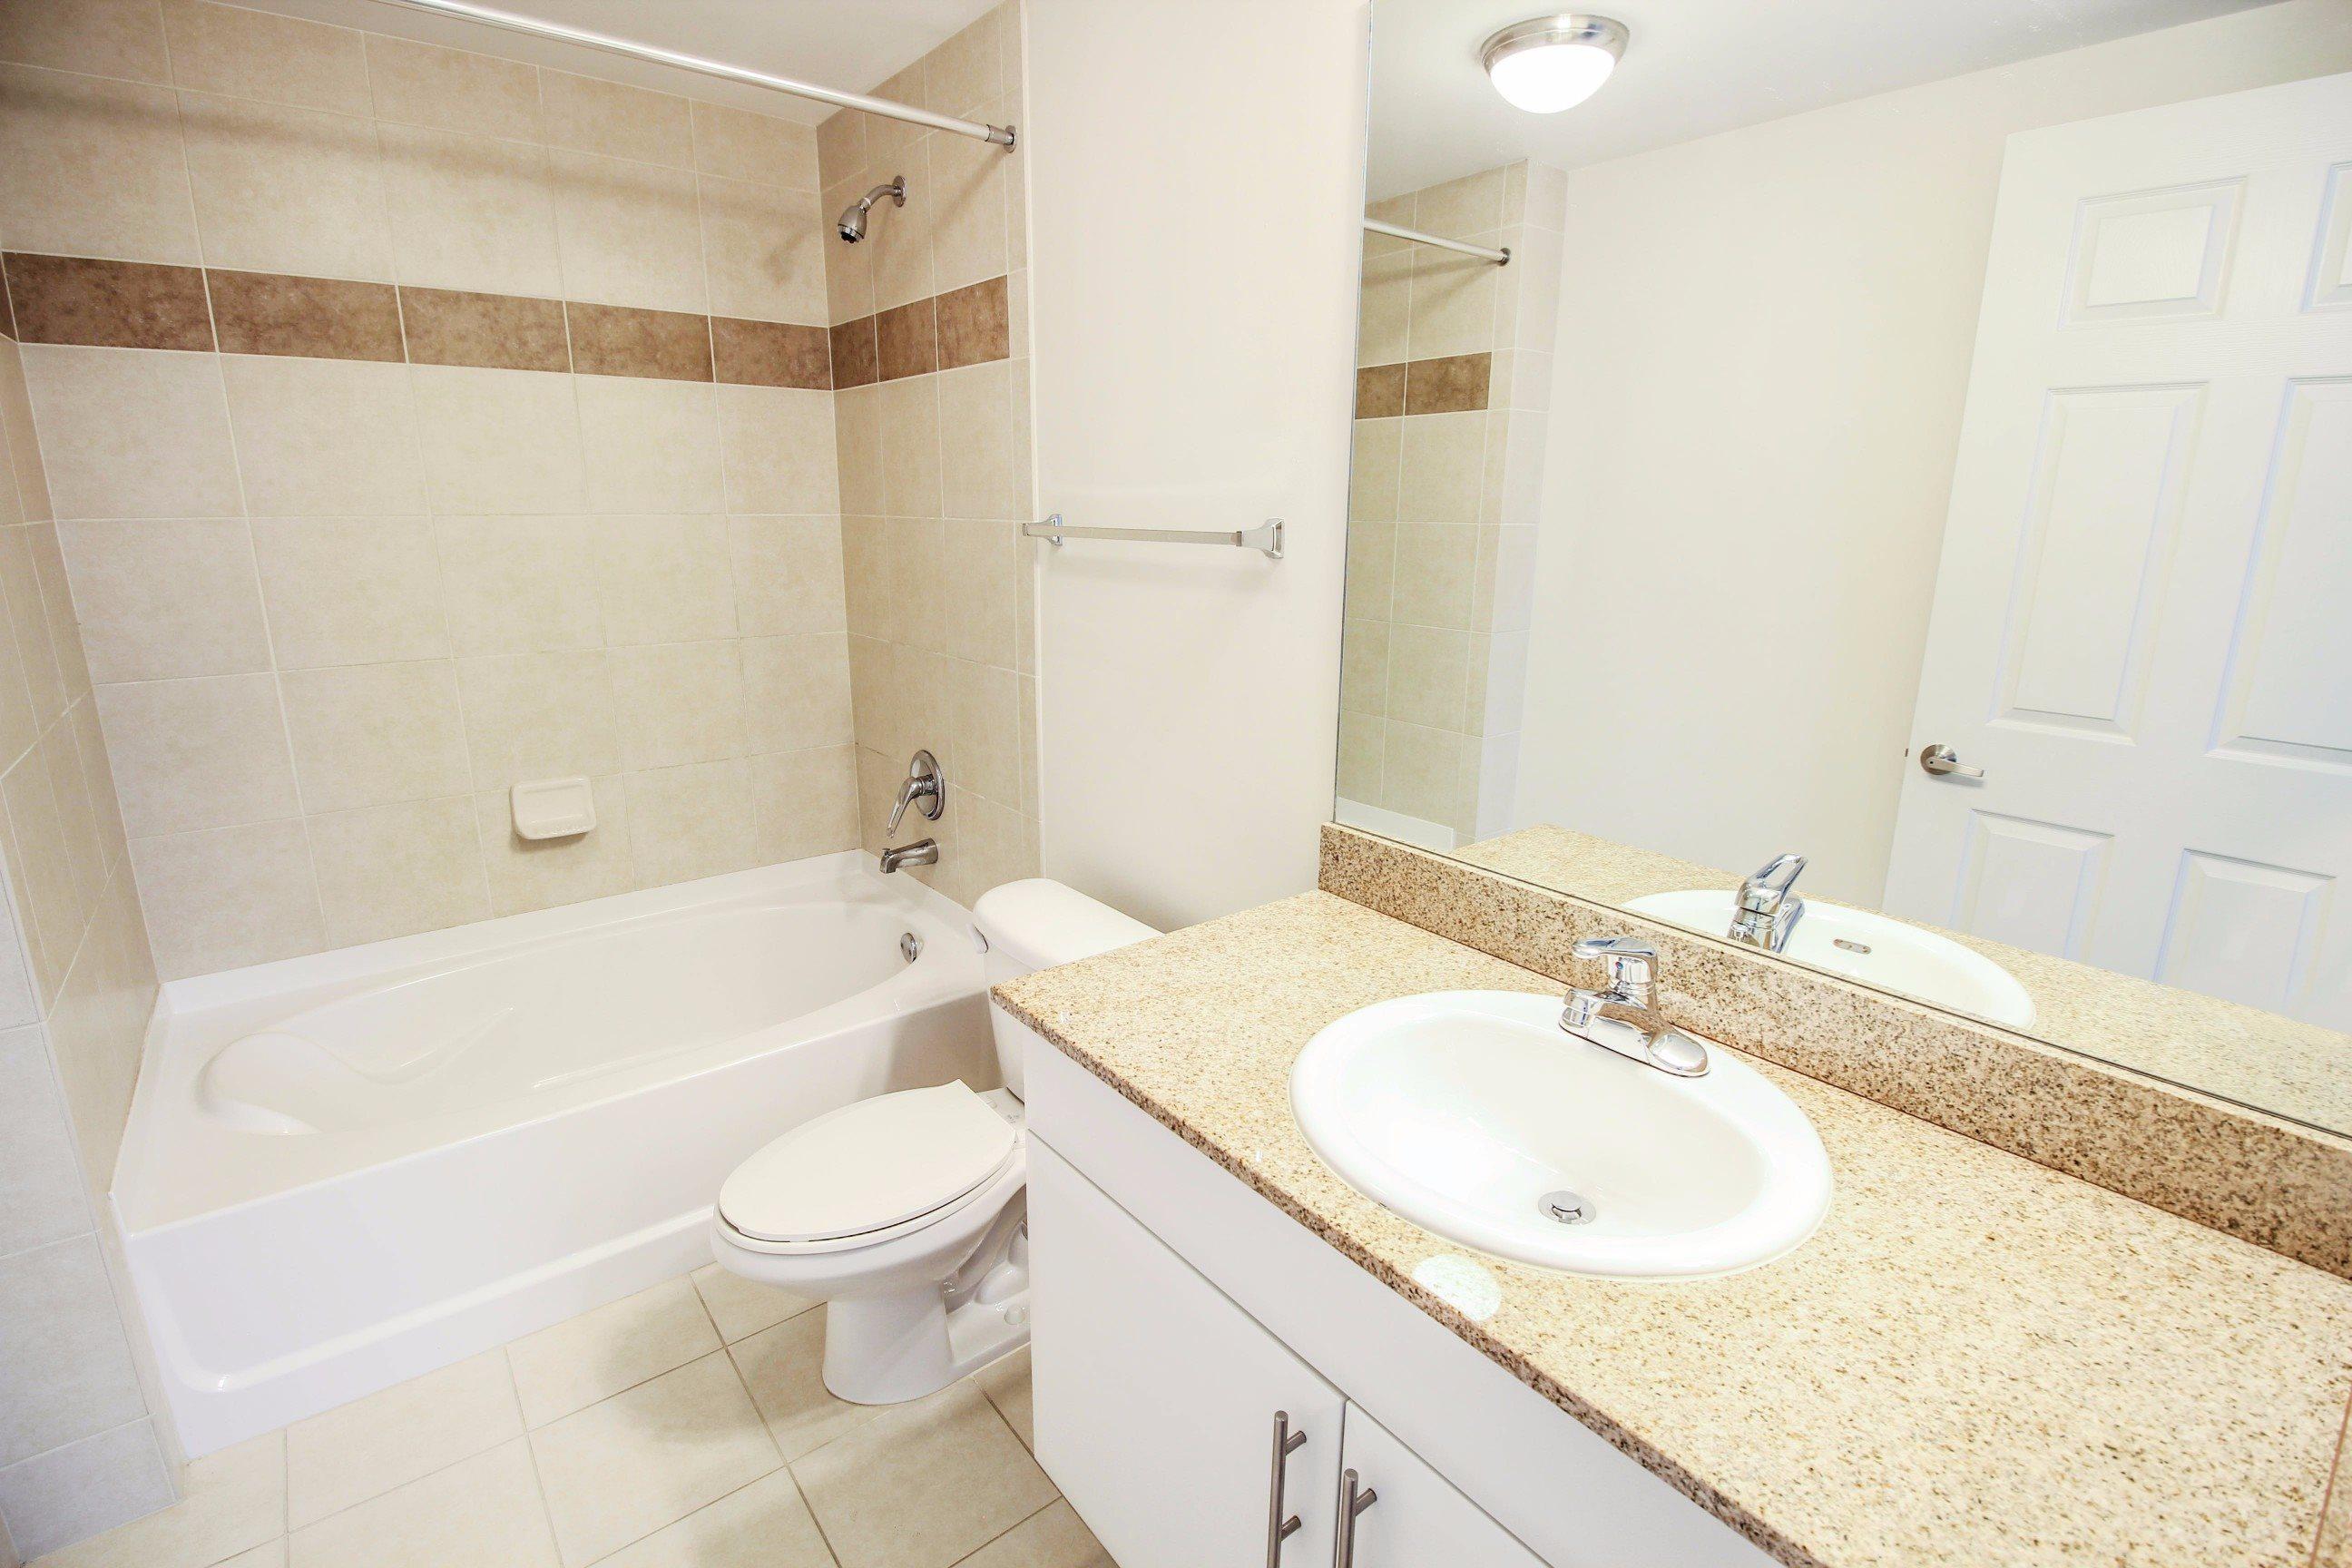 Midtown 24 Bathroom with Garden Tub